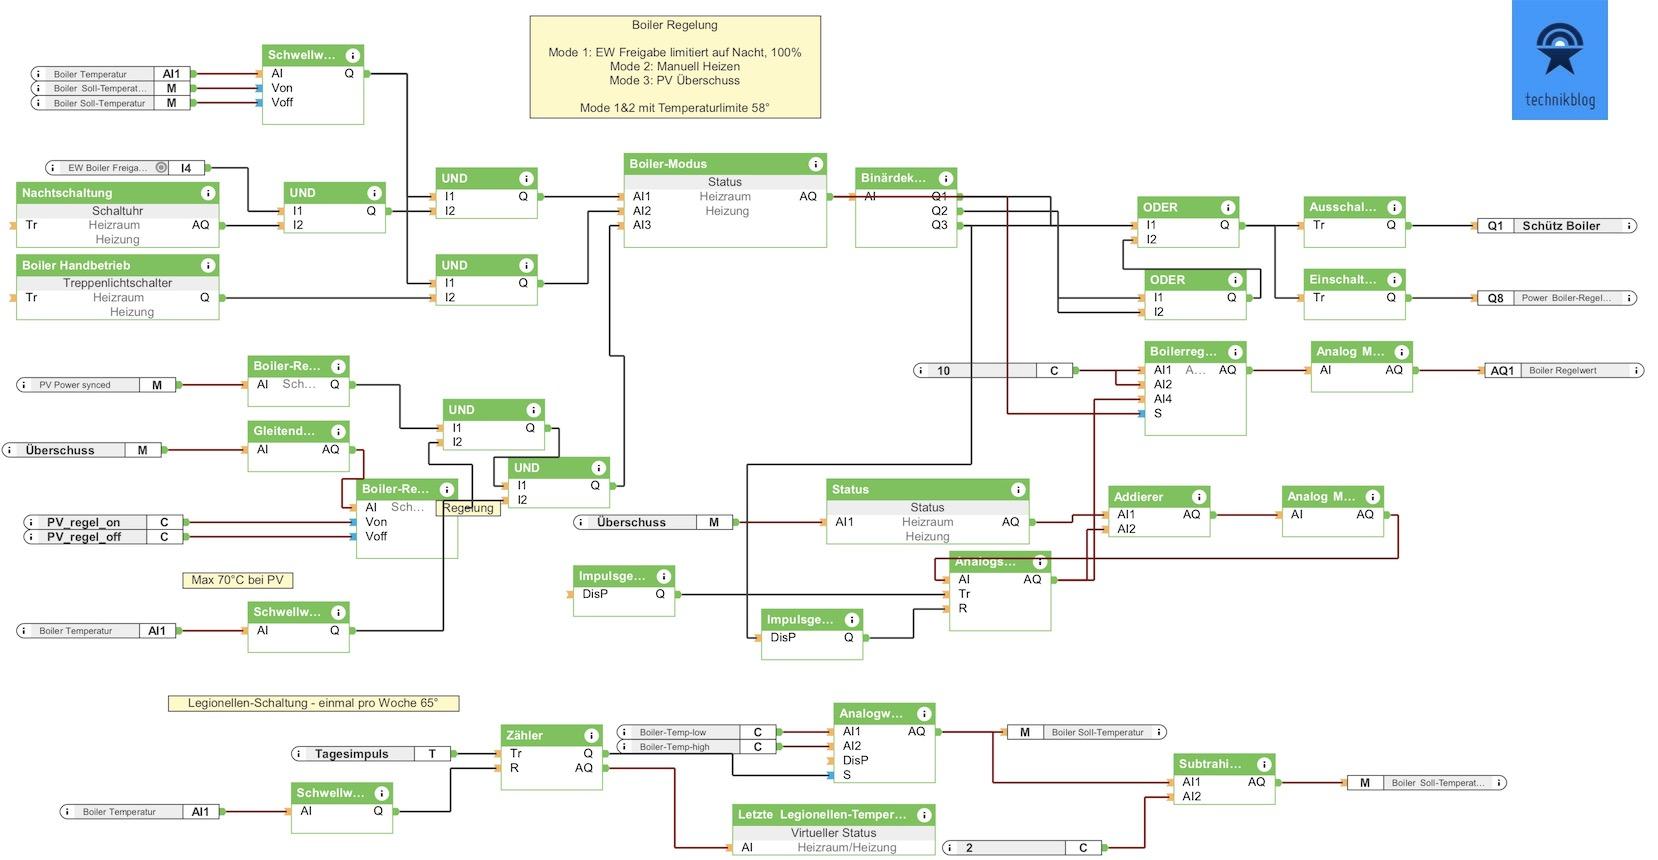 Loxone Programm: Boiler Regelung